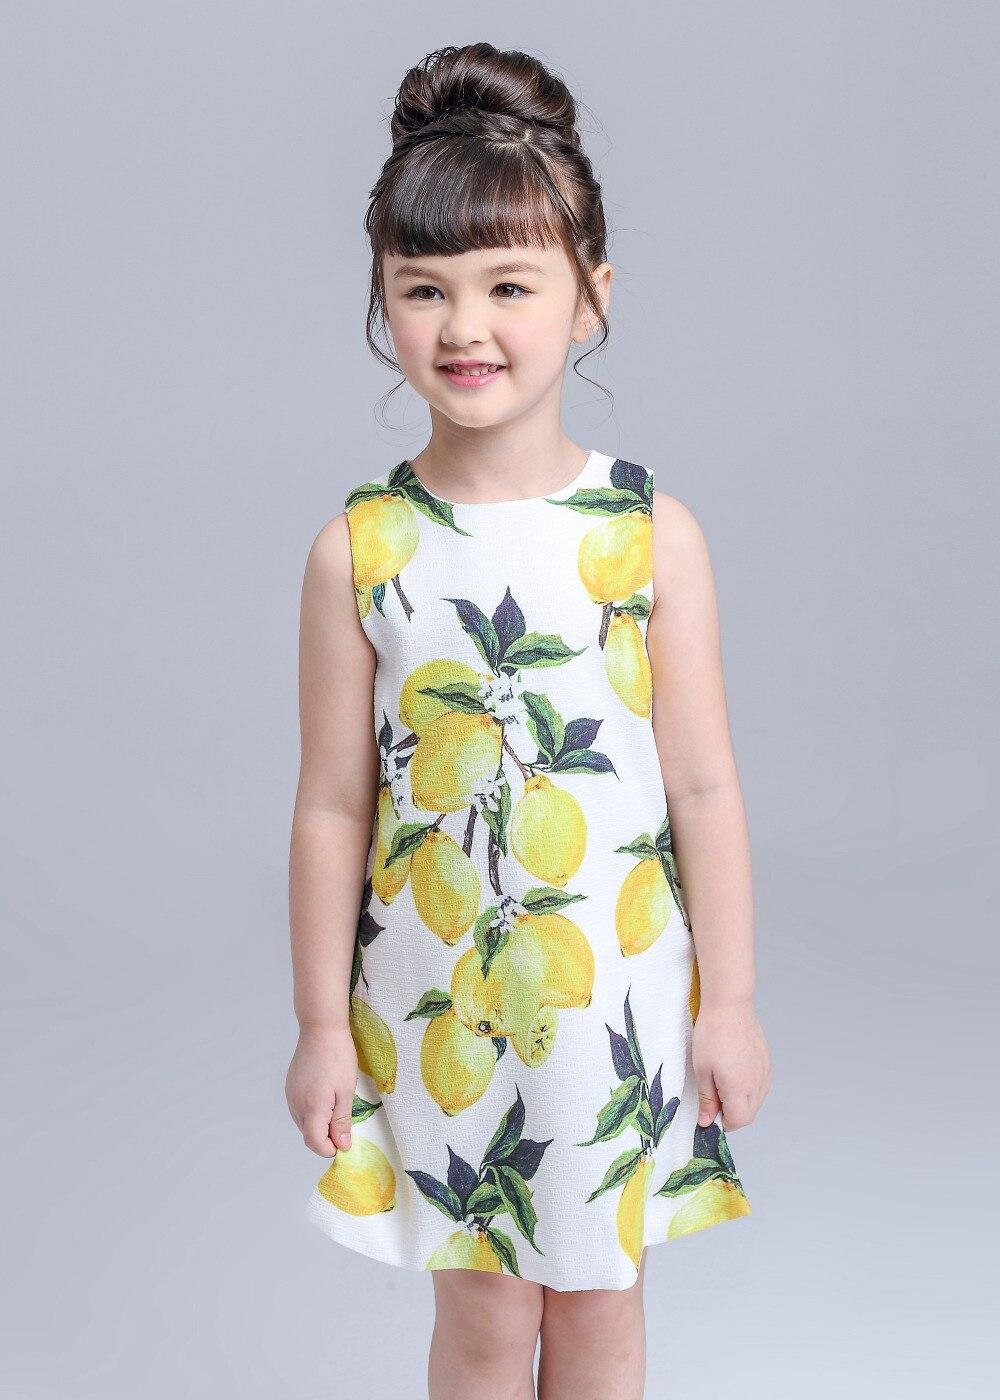 Kimocat Girls Dresses Summer 2017 Party Dress Infant Lemon Color